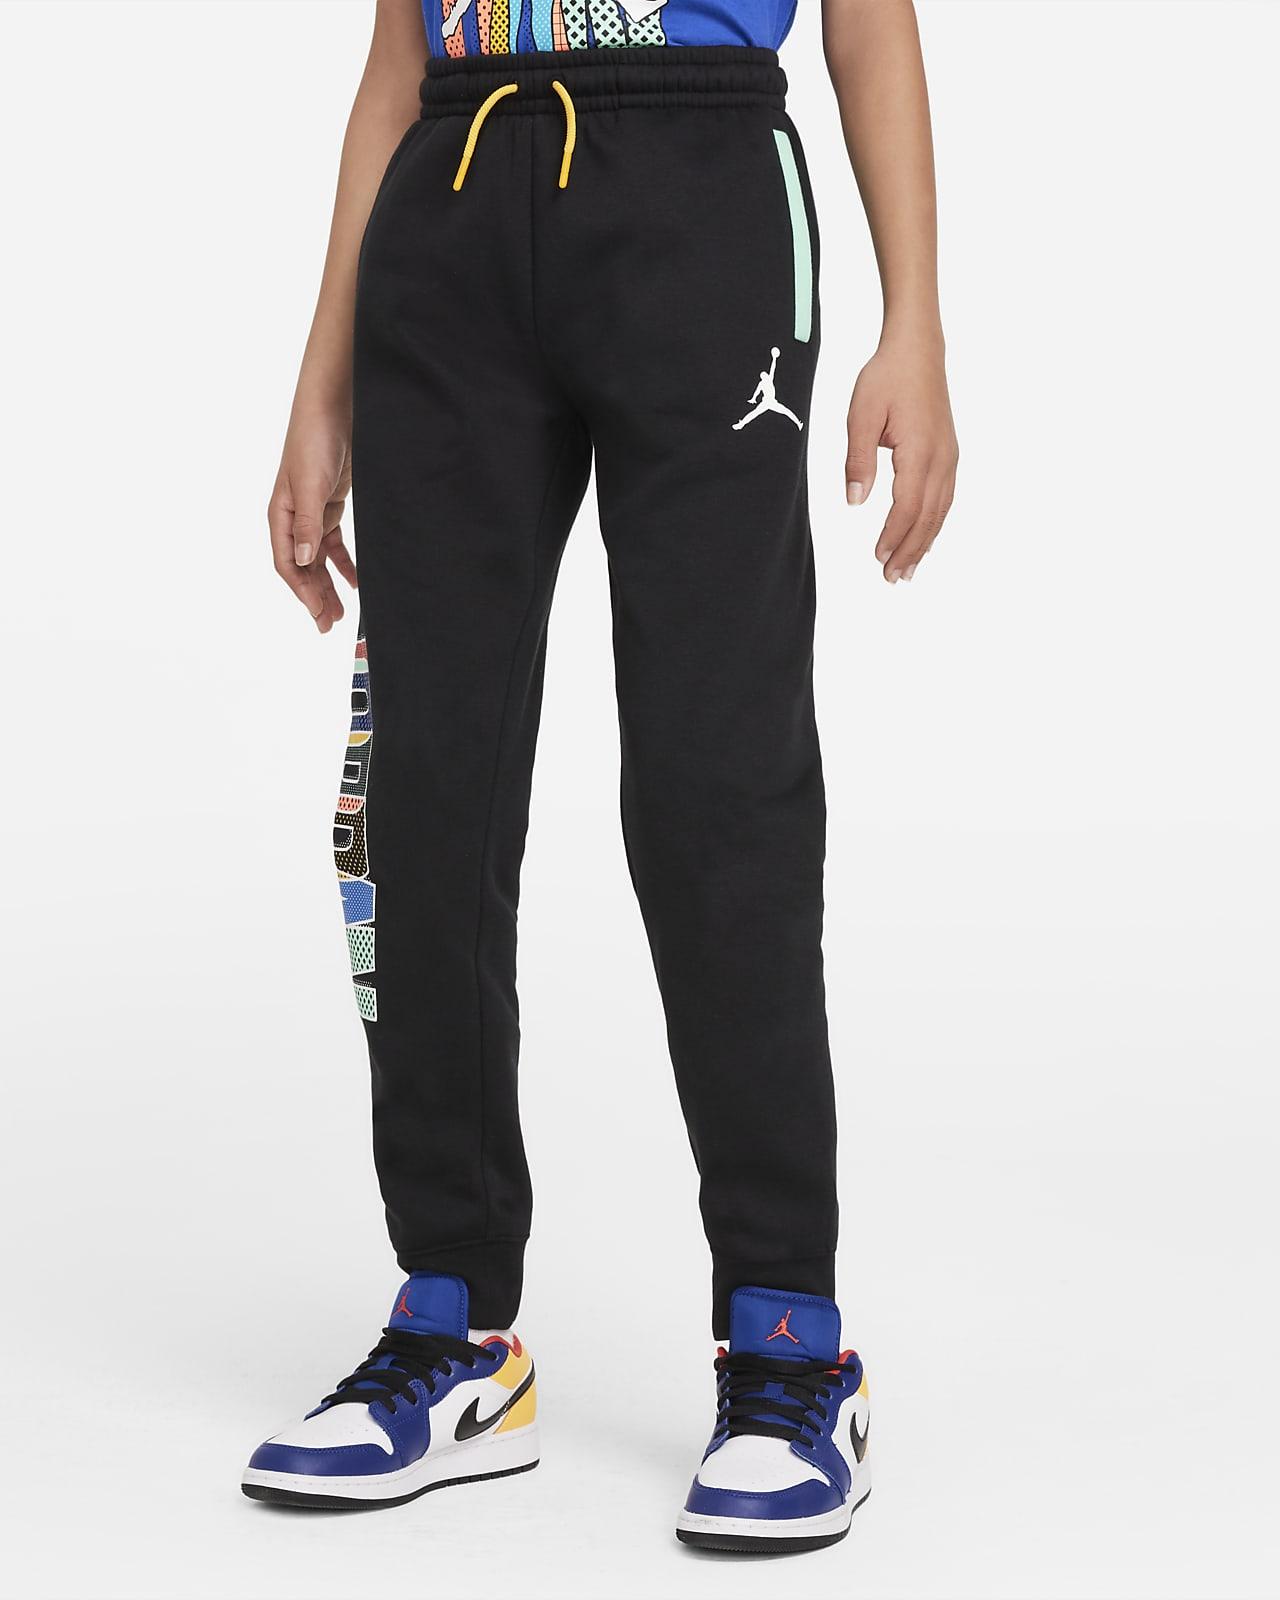 Pantalones para niño talla grande Jordan